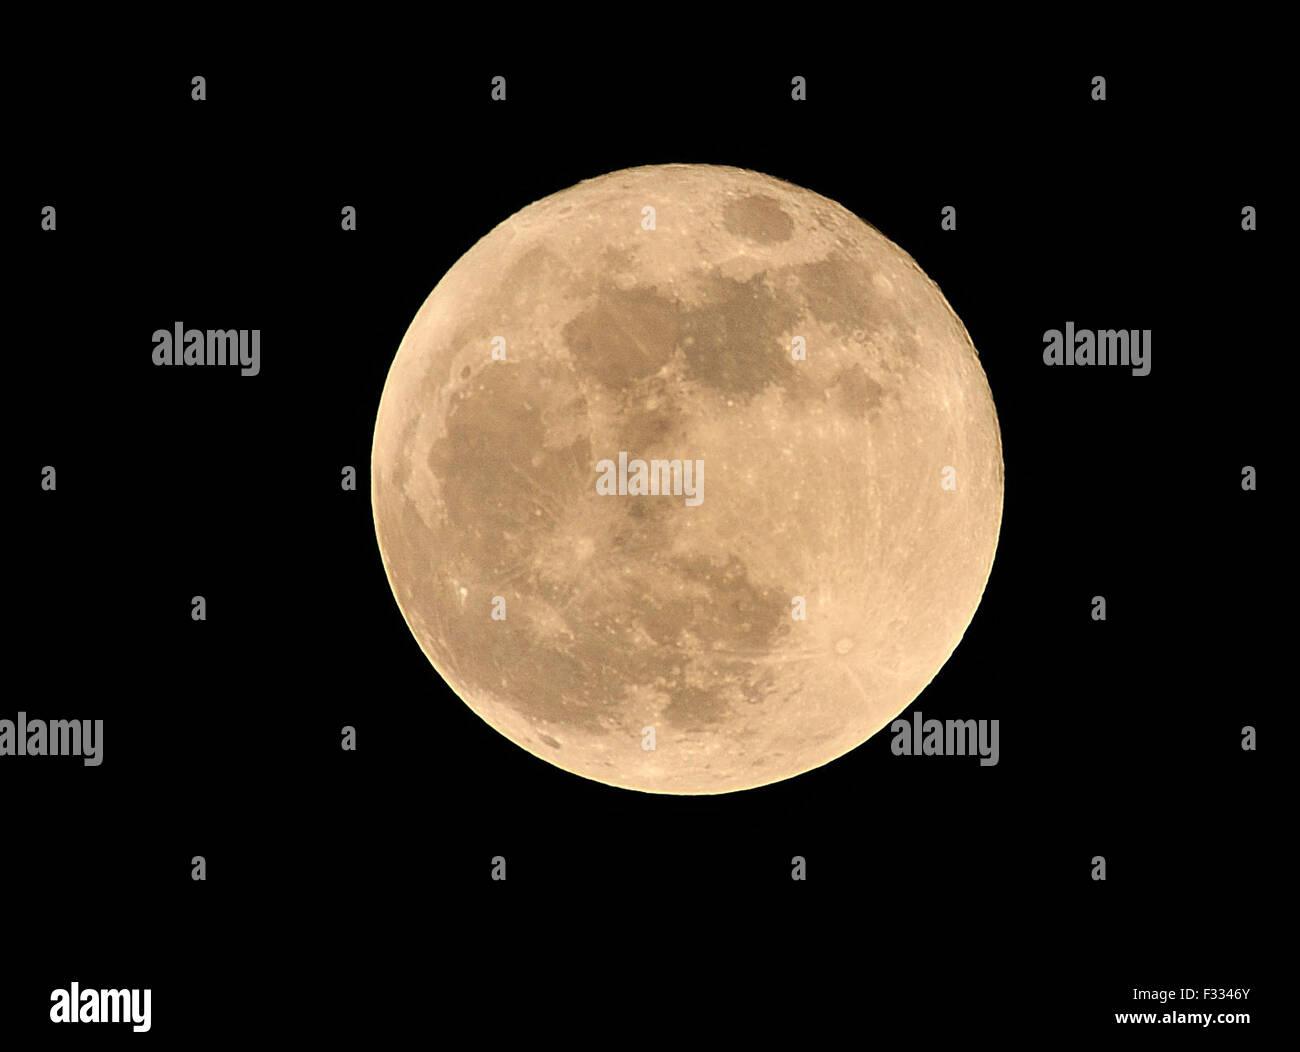 ec9db19cd1fd4 Super Moon Cebu City Philippines Stock Photo  87964995 - Alamy